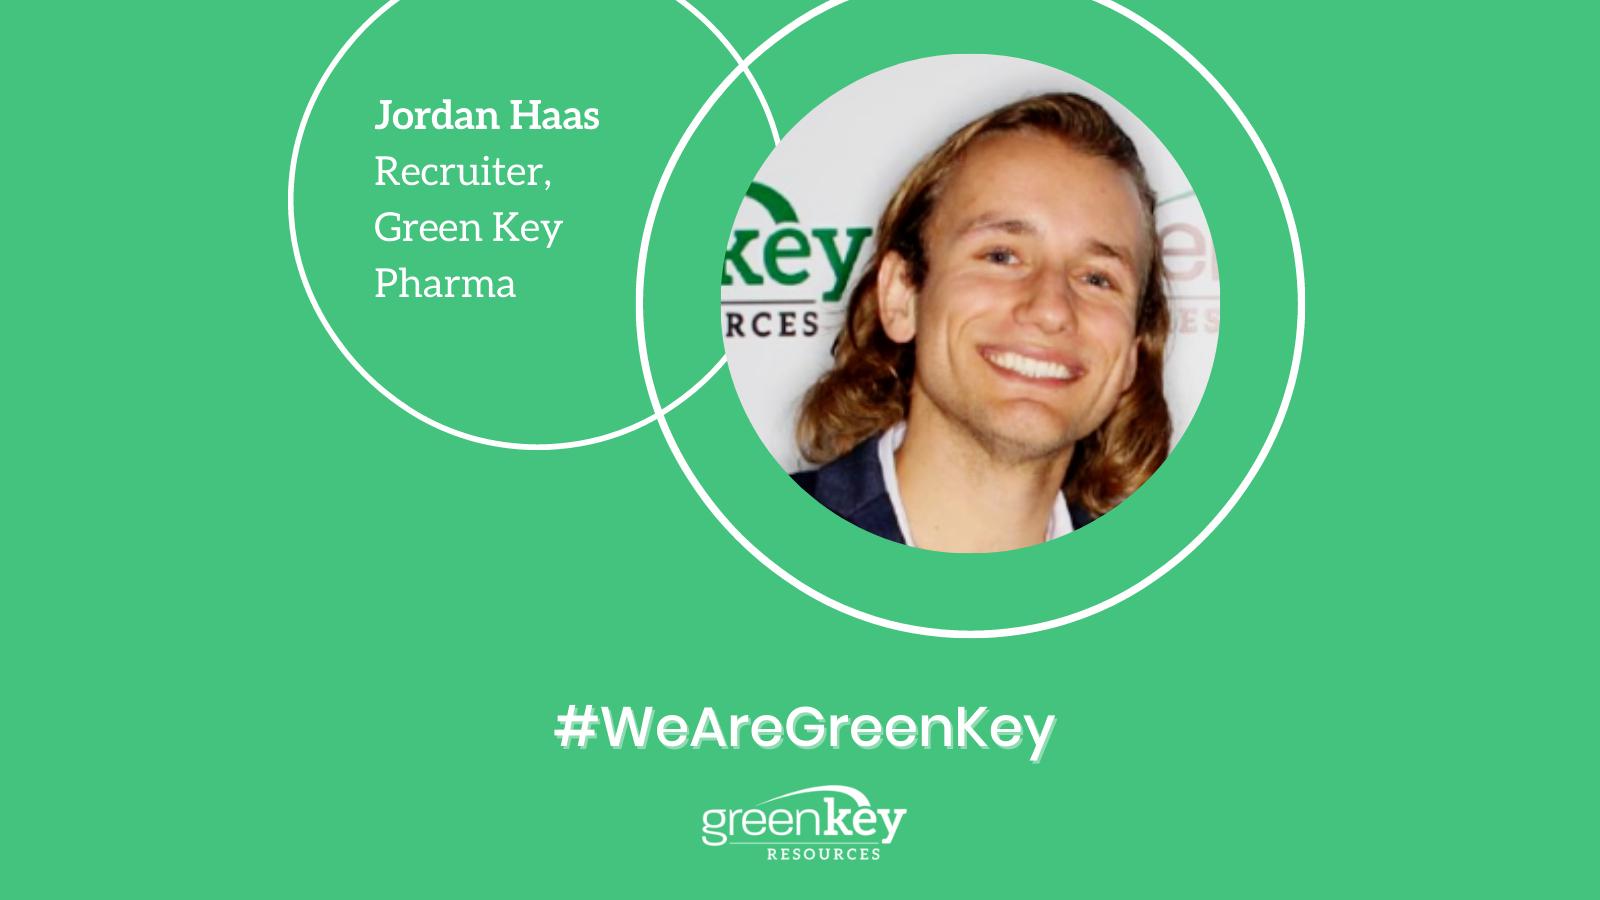 Jordan Haas - Recruiter, Green Key Pharma